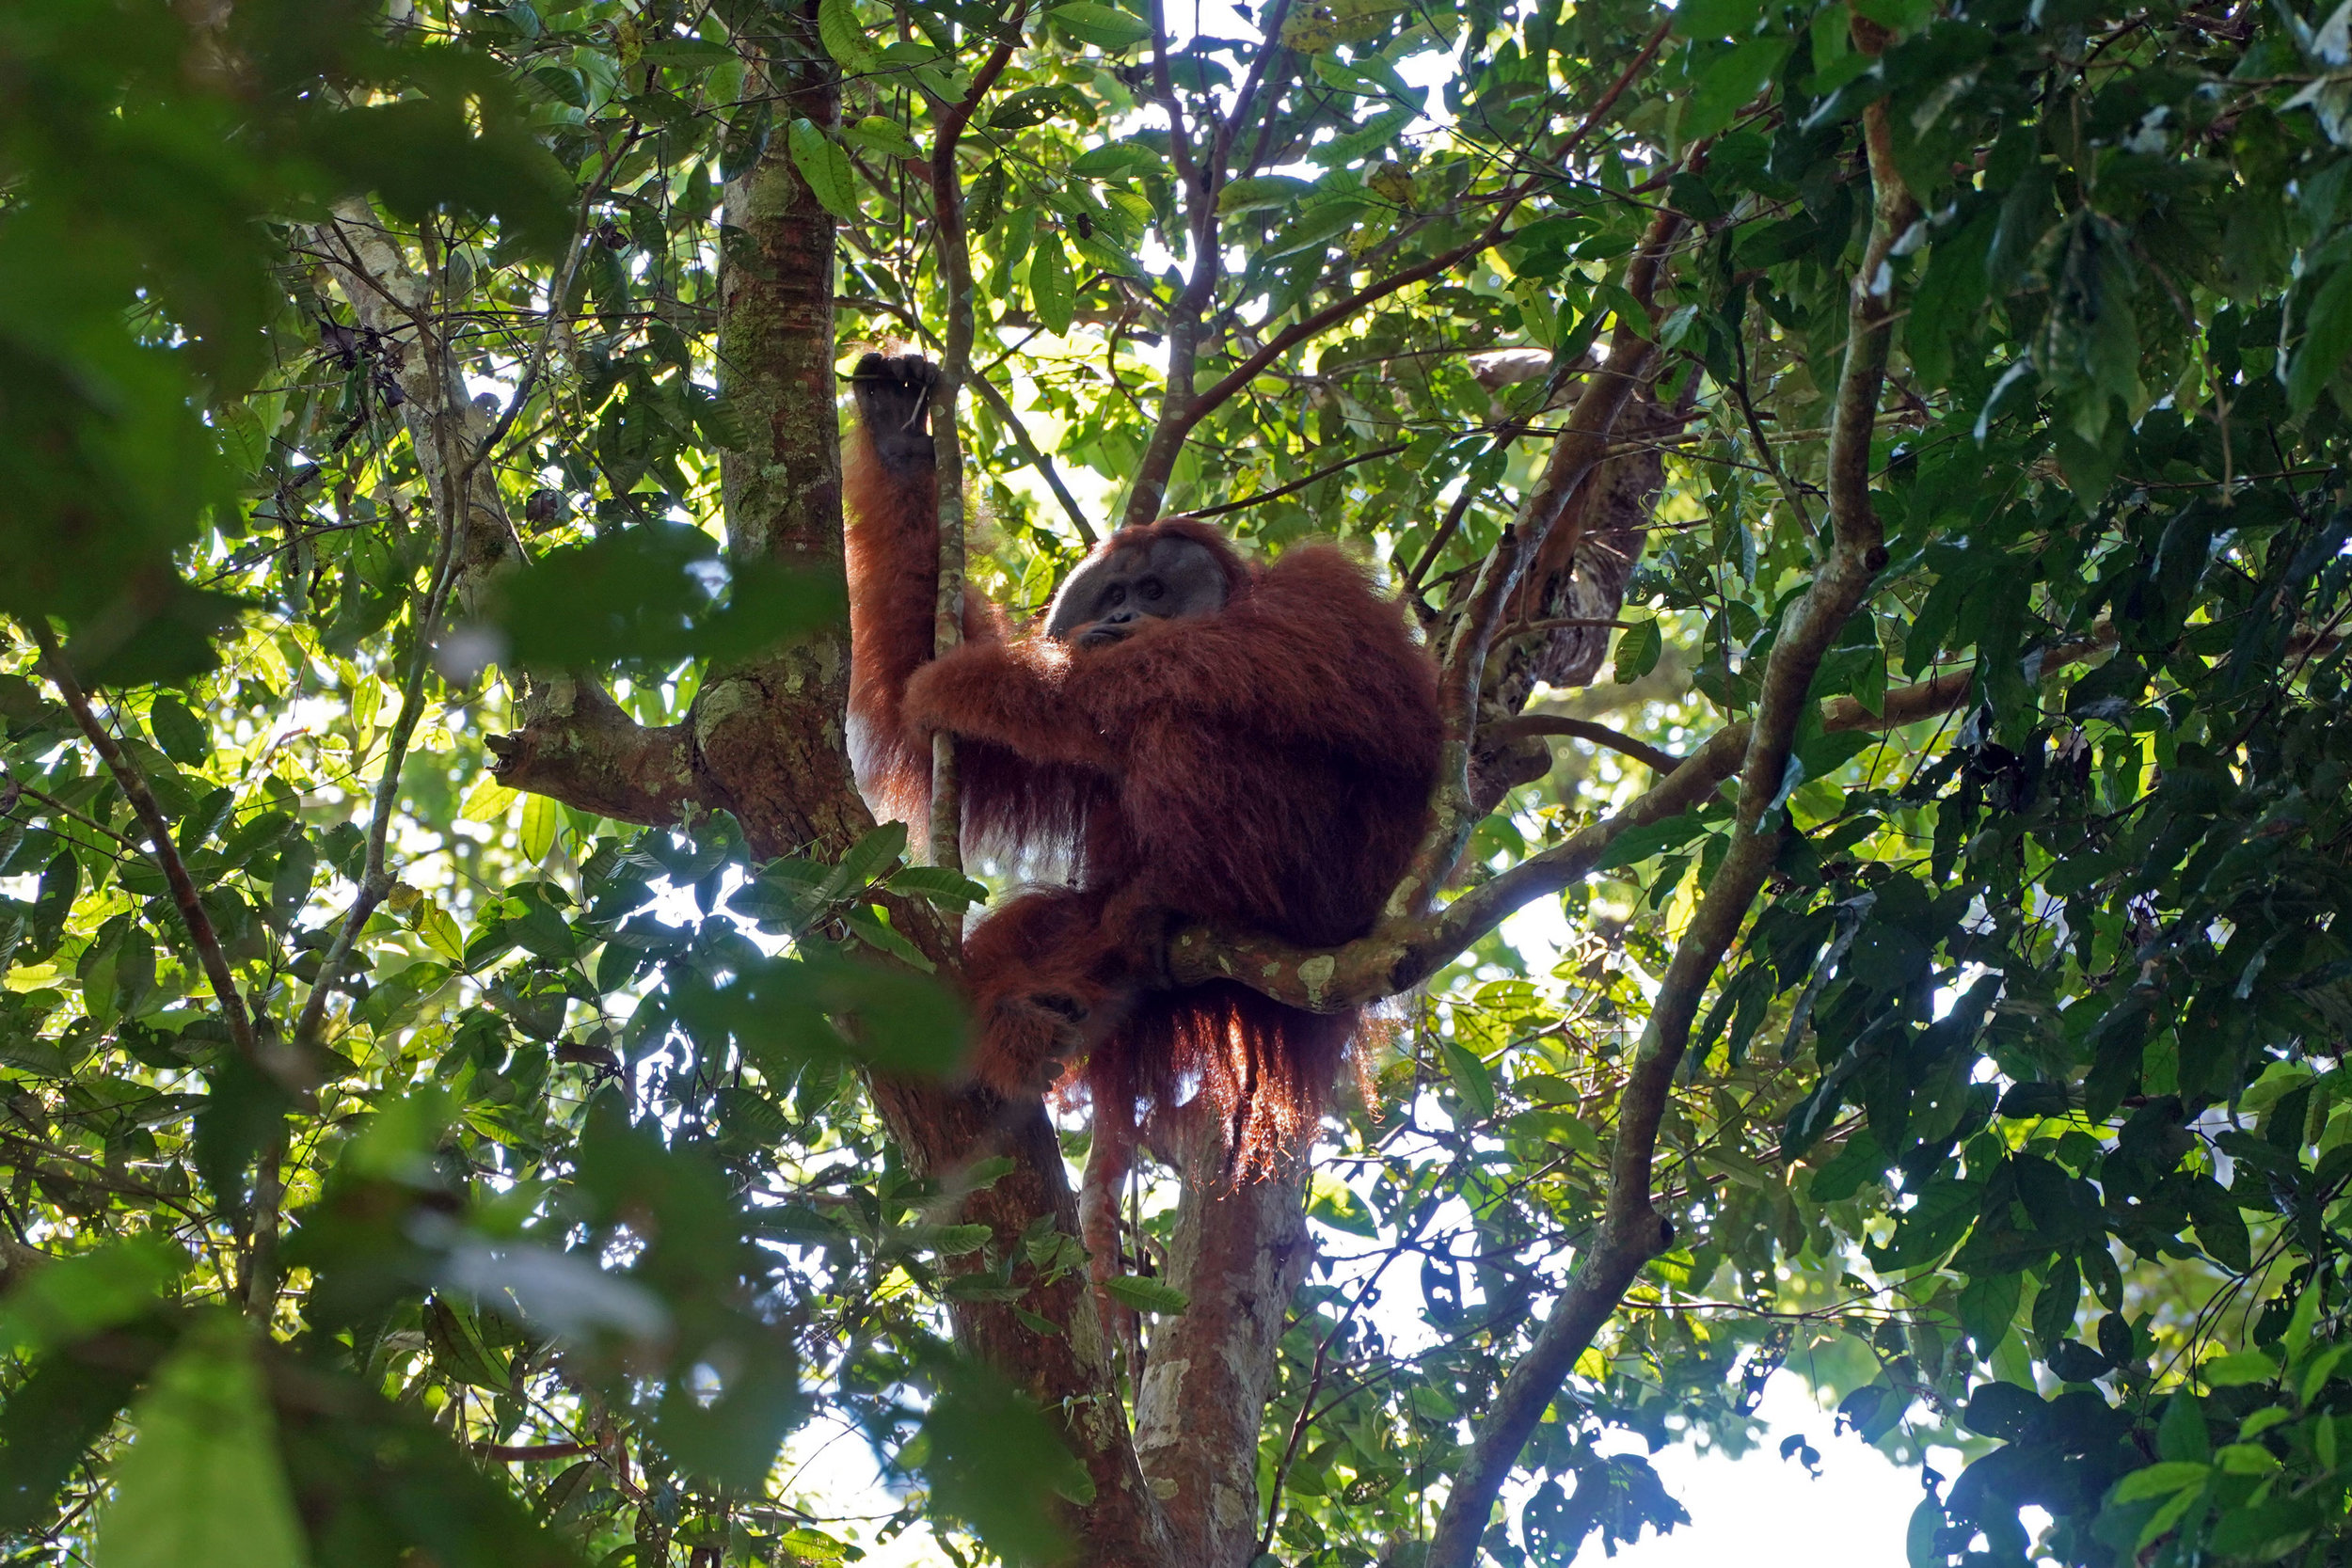 wild-orangutan-orangutang-sumatra-indinesia-gunung-leuser-national-park-ketambe-trekking-guide-travel-inertia-network.jpg